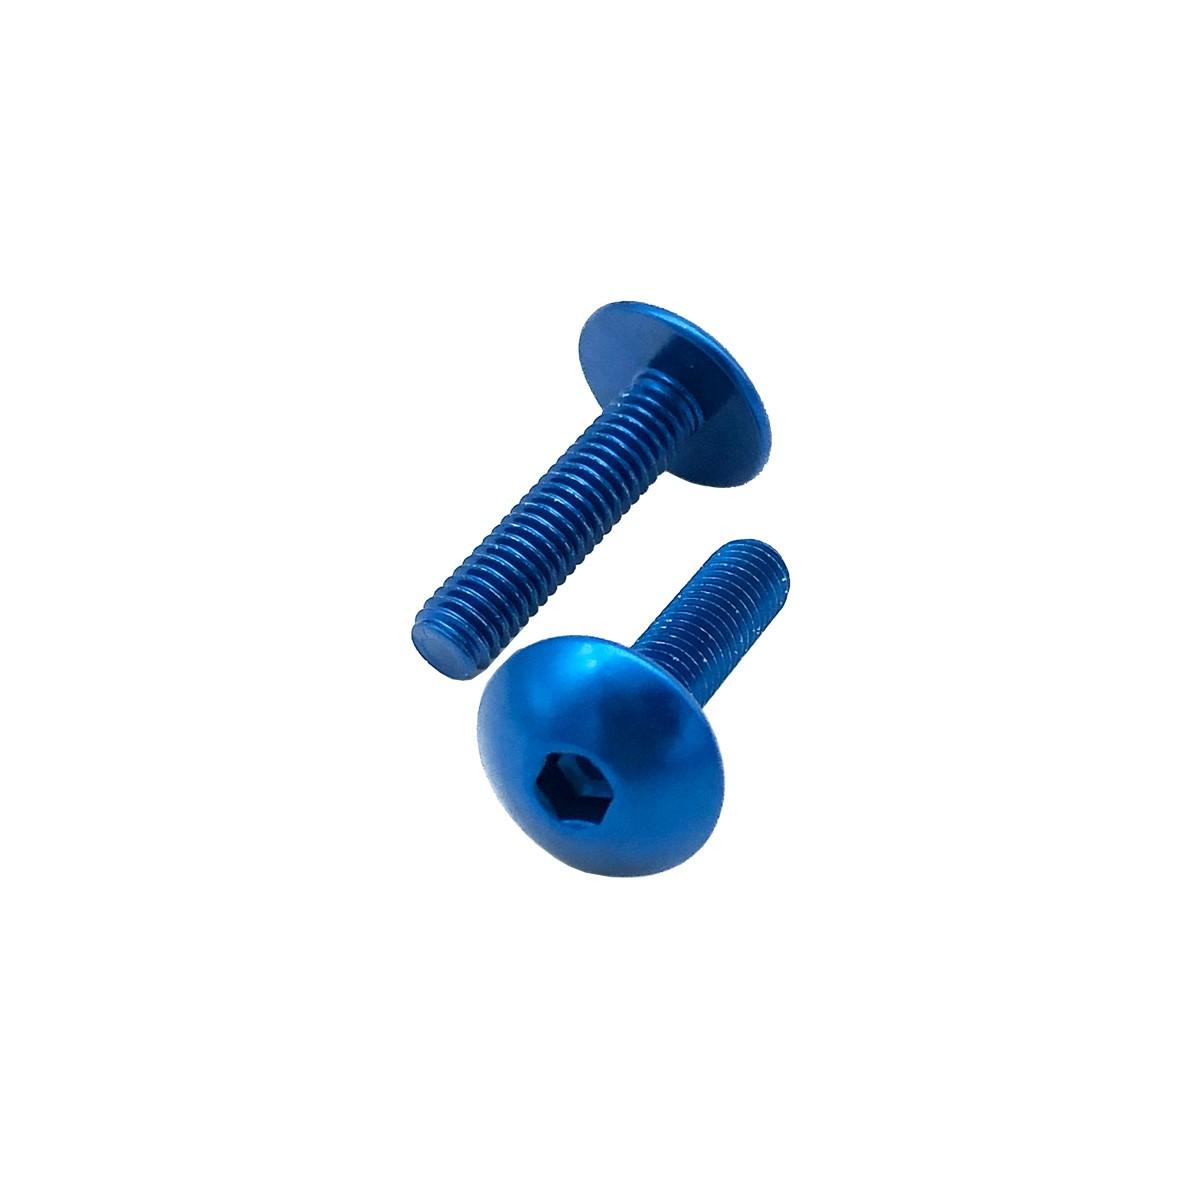 Parafuso Carenagem Allen de Alumínio Dome Head M5 x 16mm Unidade Azul